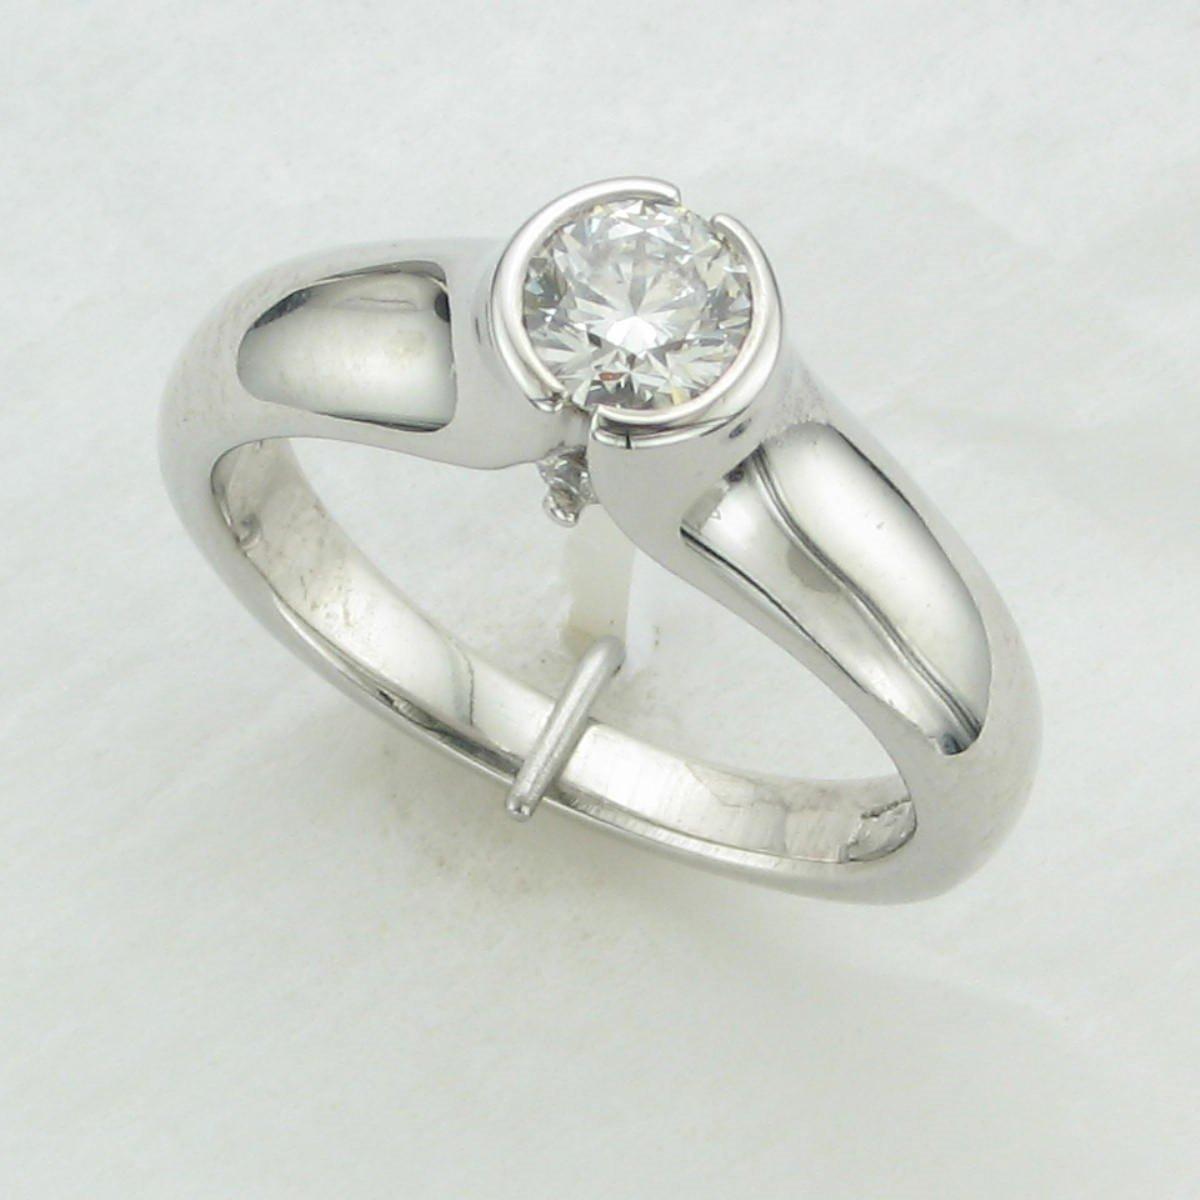 0.51ct Round Diamond Ring set in 14K White Gold